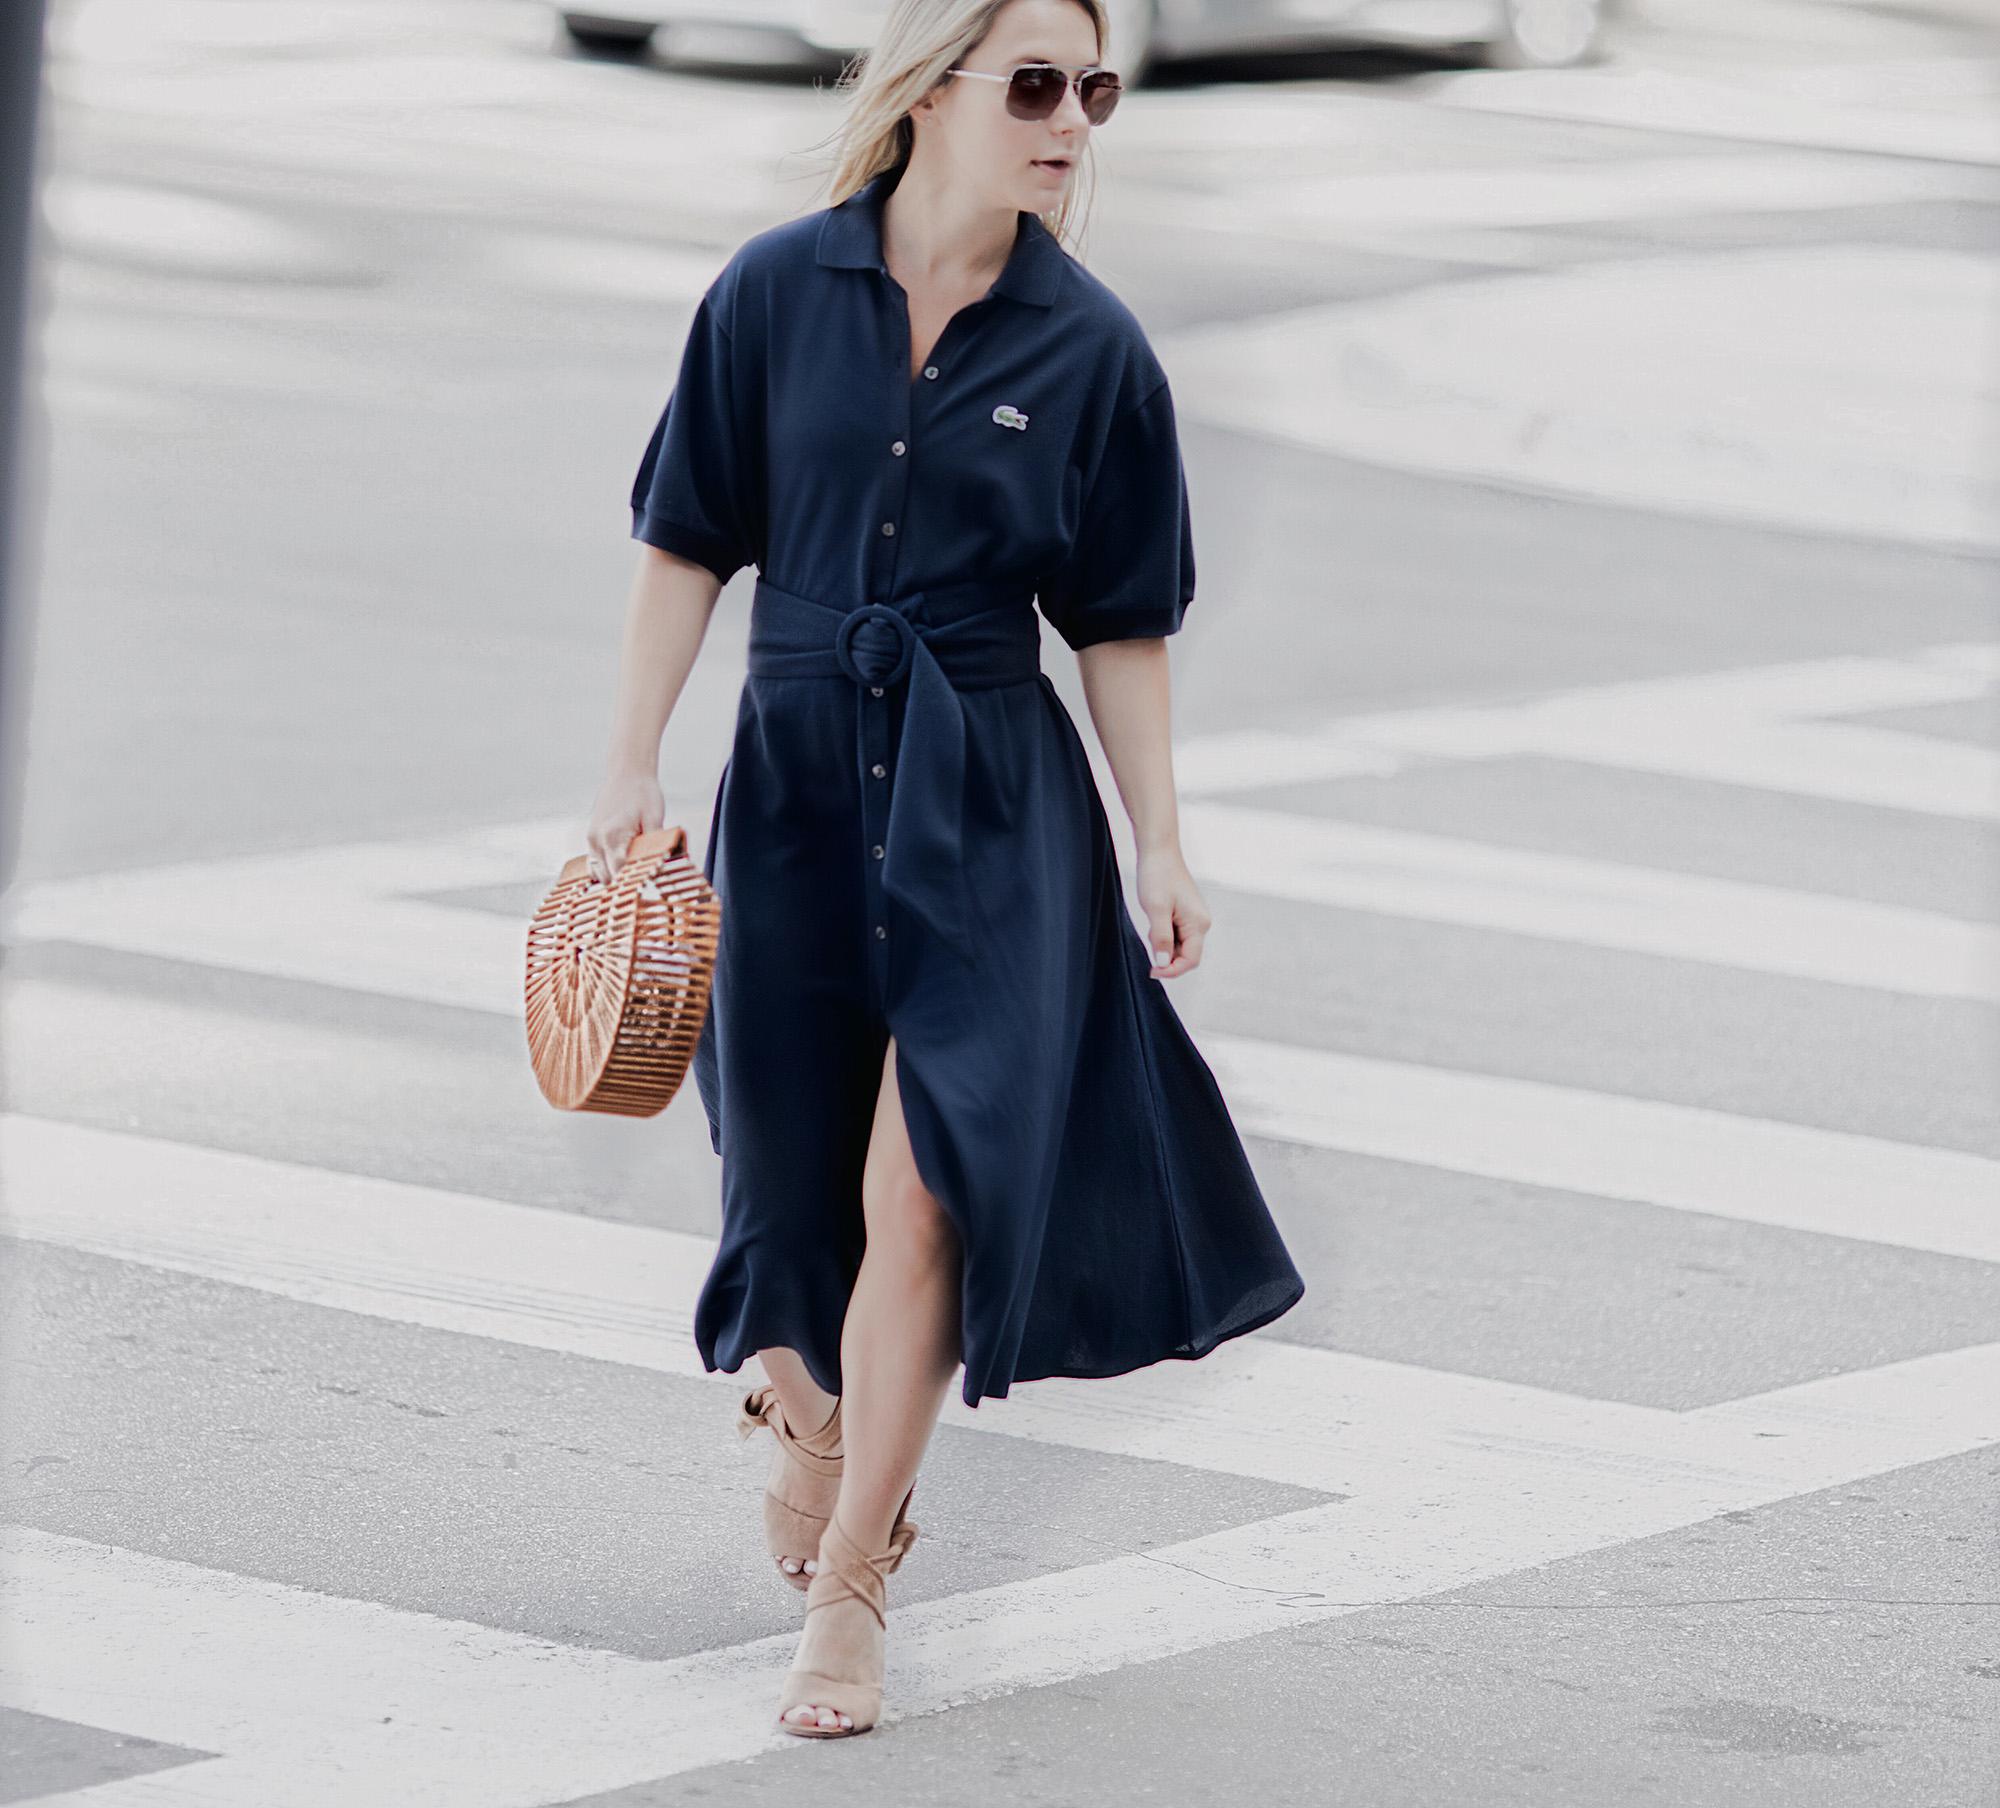 miami-open-tennis-lacoste-blue-dress